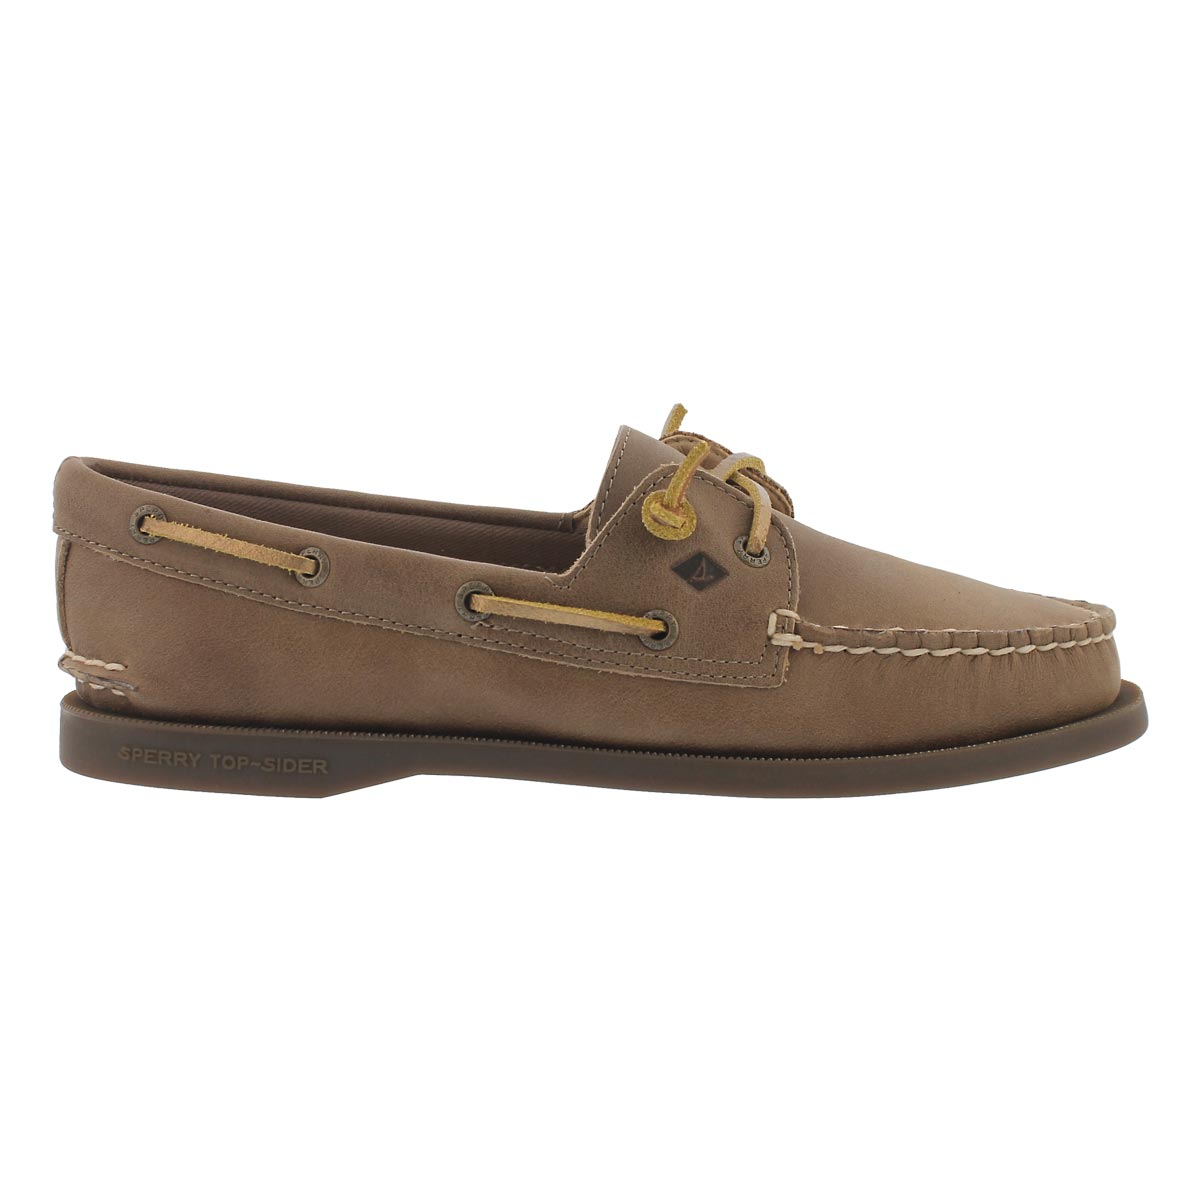 Lds A/O Vida pinebark boat shoe